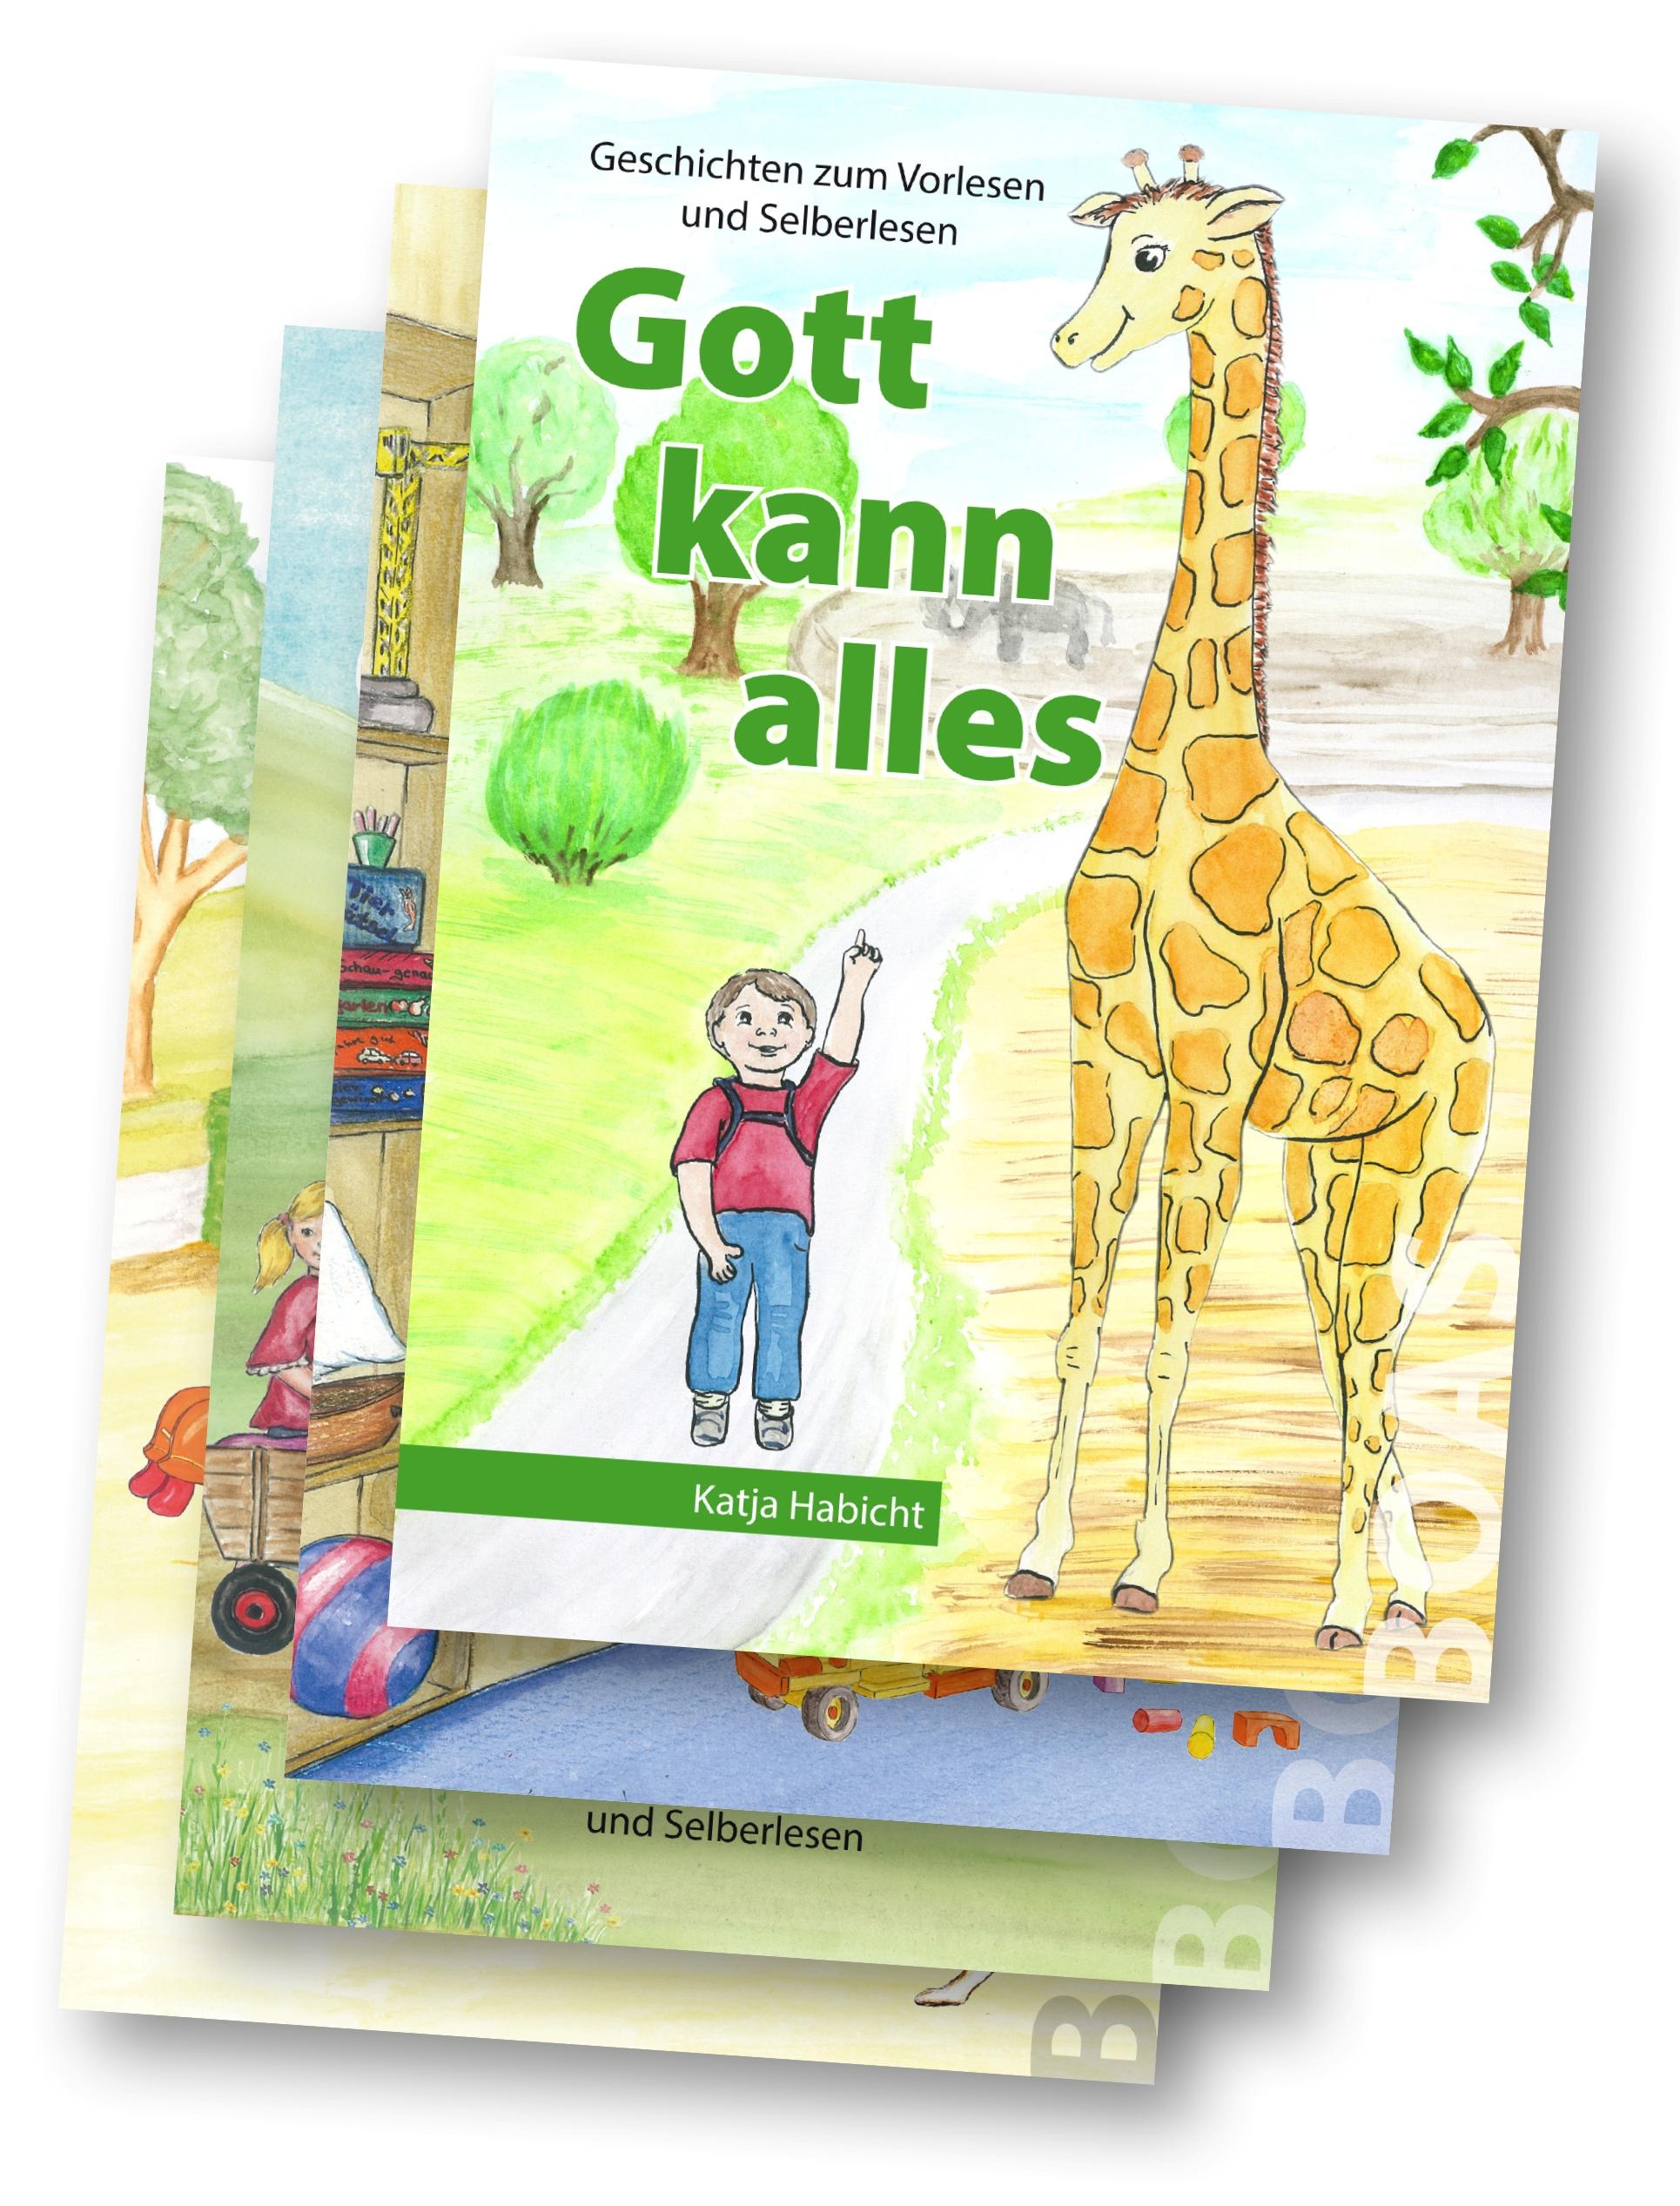 Gott kann alles, Katja Habicht